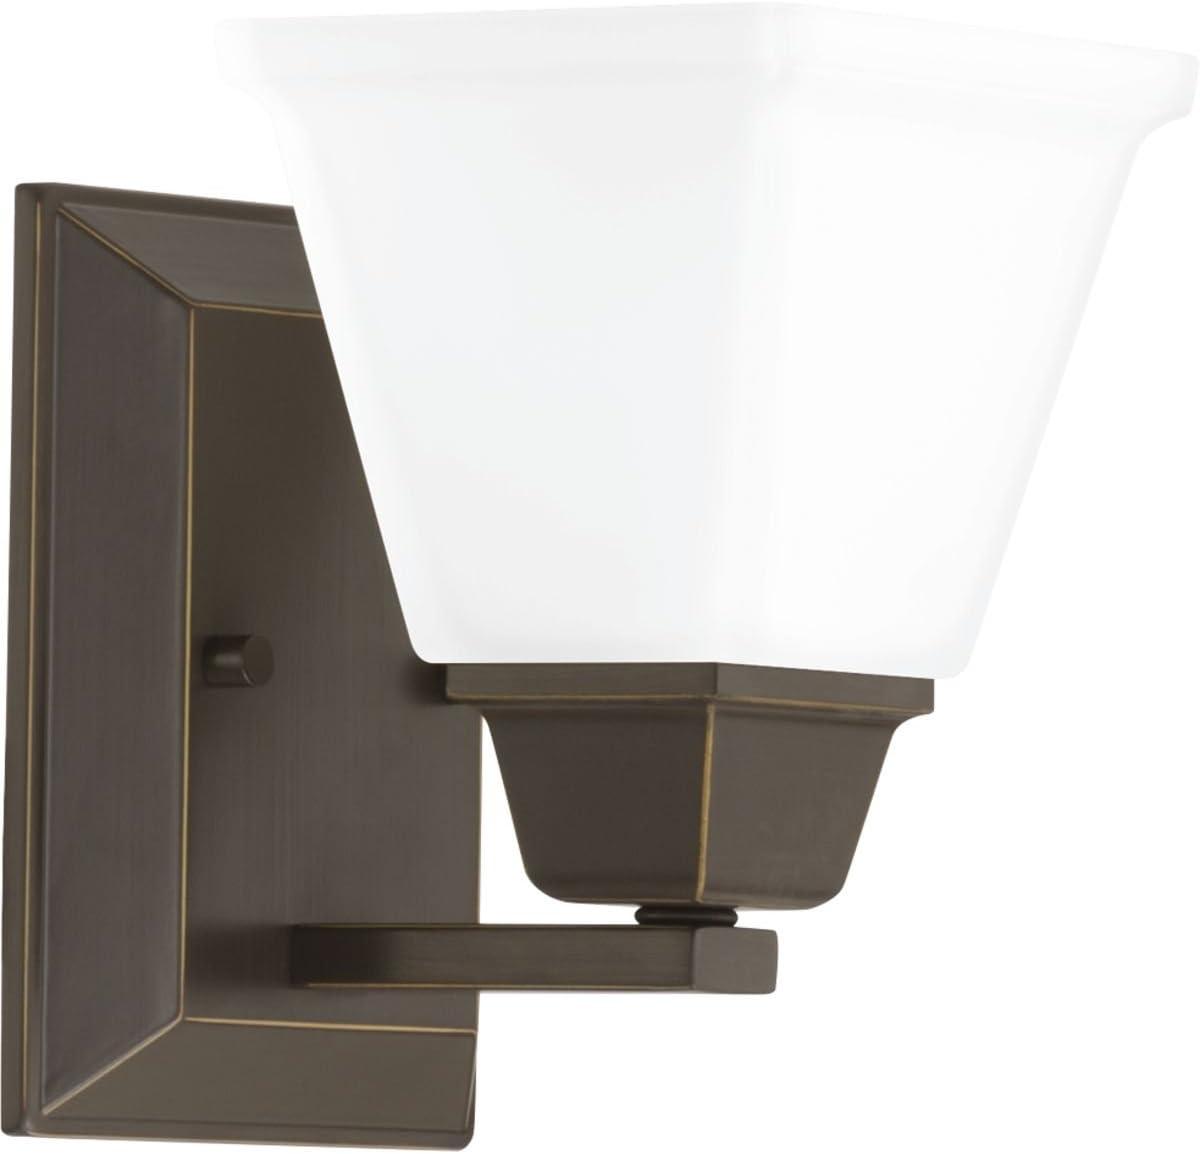 Progress Max 86% OFF Lighting P300158-020 Clifton Heights Bro Bath Vanity Regular dealer